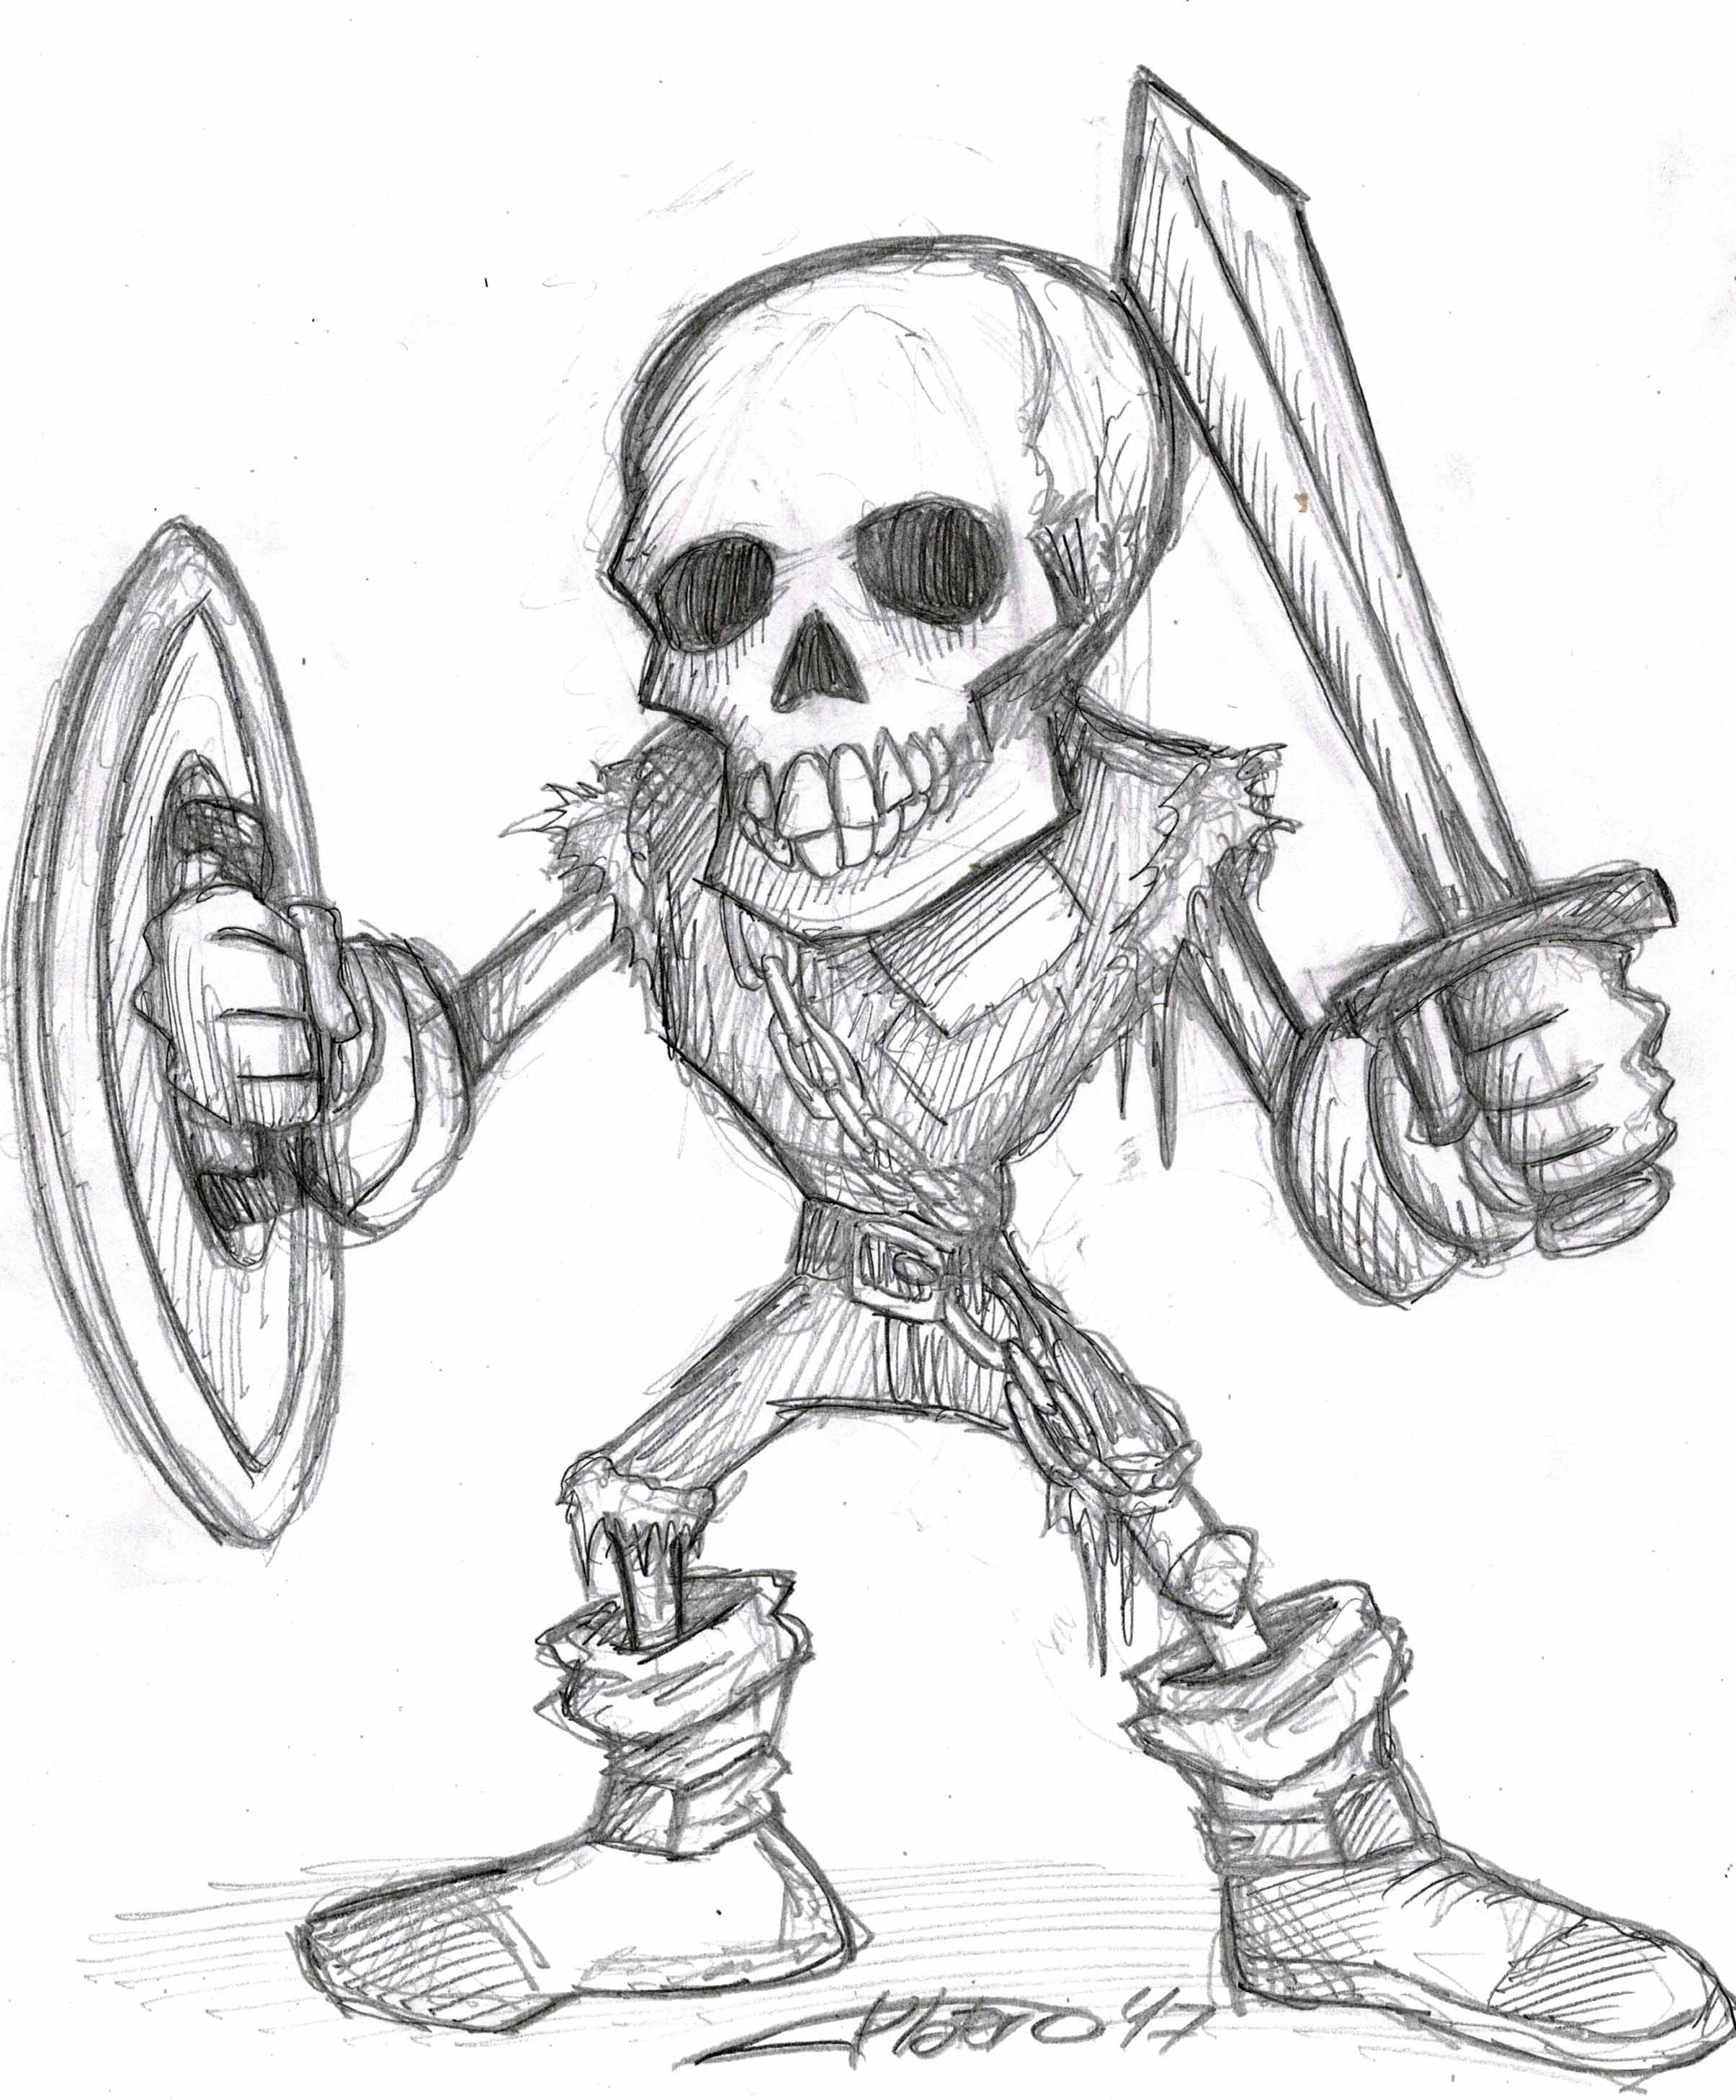 Caballero Esqueleto